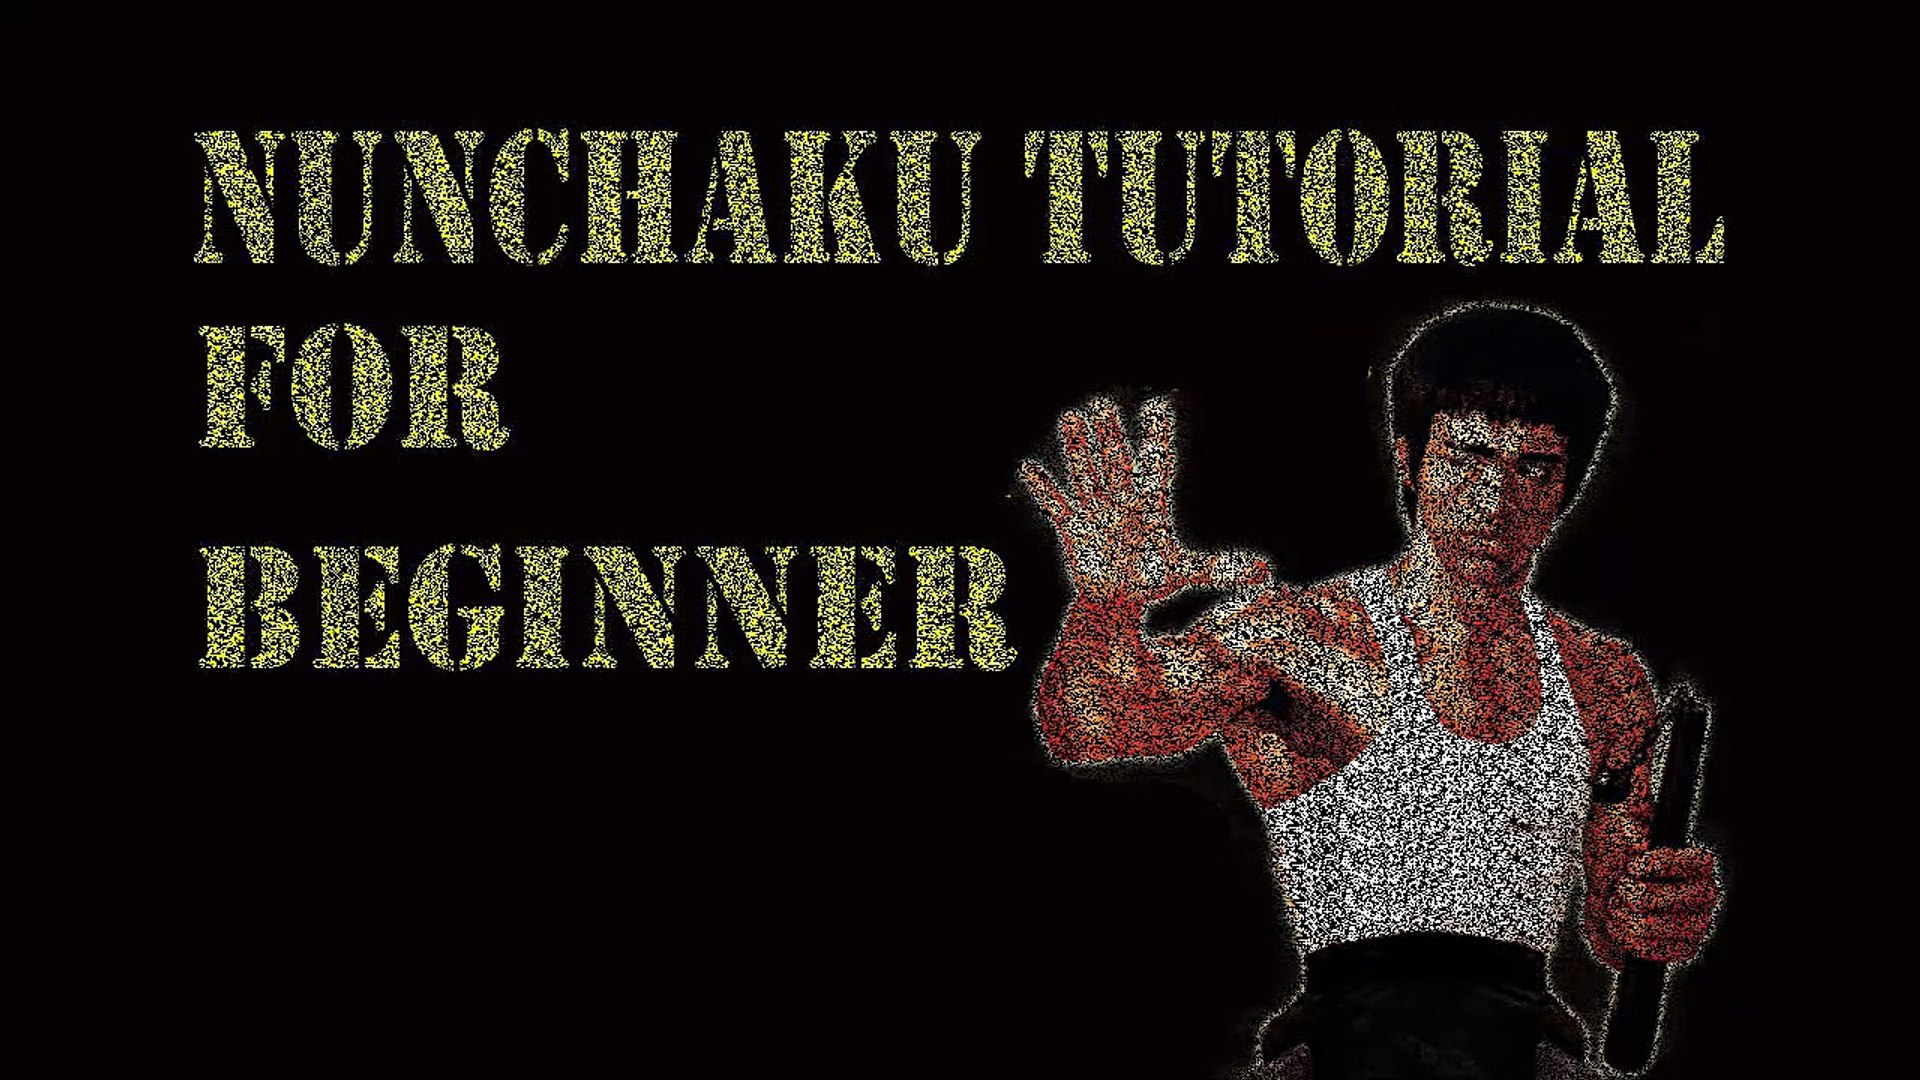 Nunchaku Wrist Front Roll Tutorial (Basic front Wrist Roll) part # 3 in [Hindi - हिन्दी]